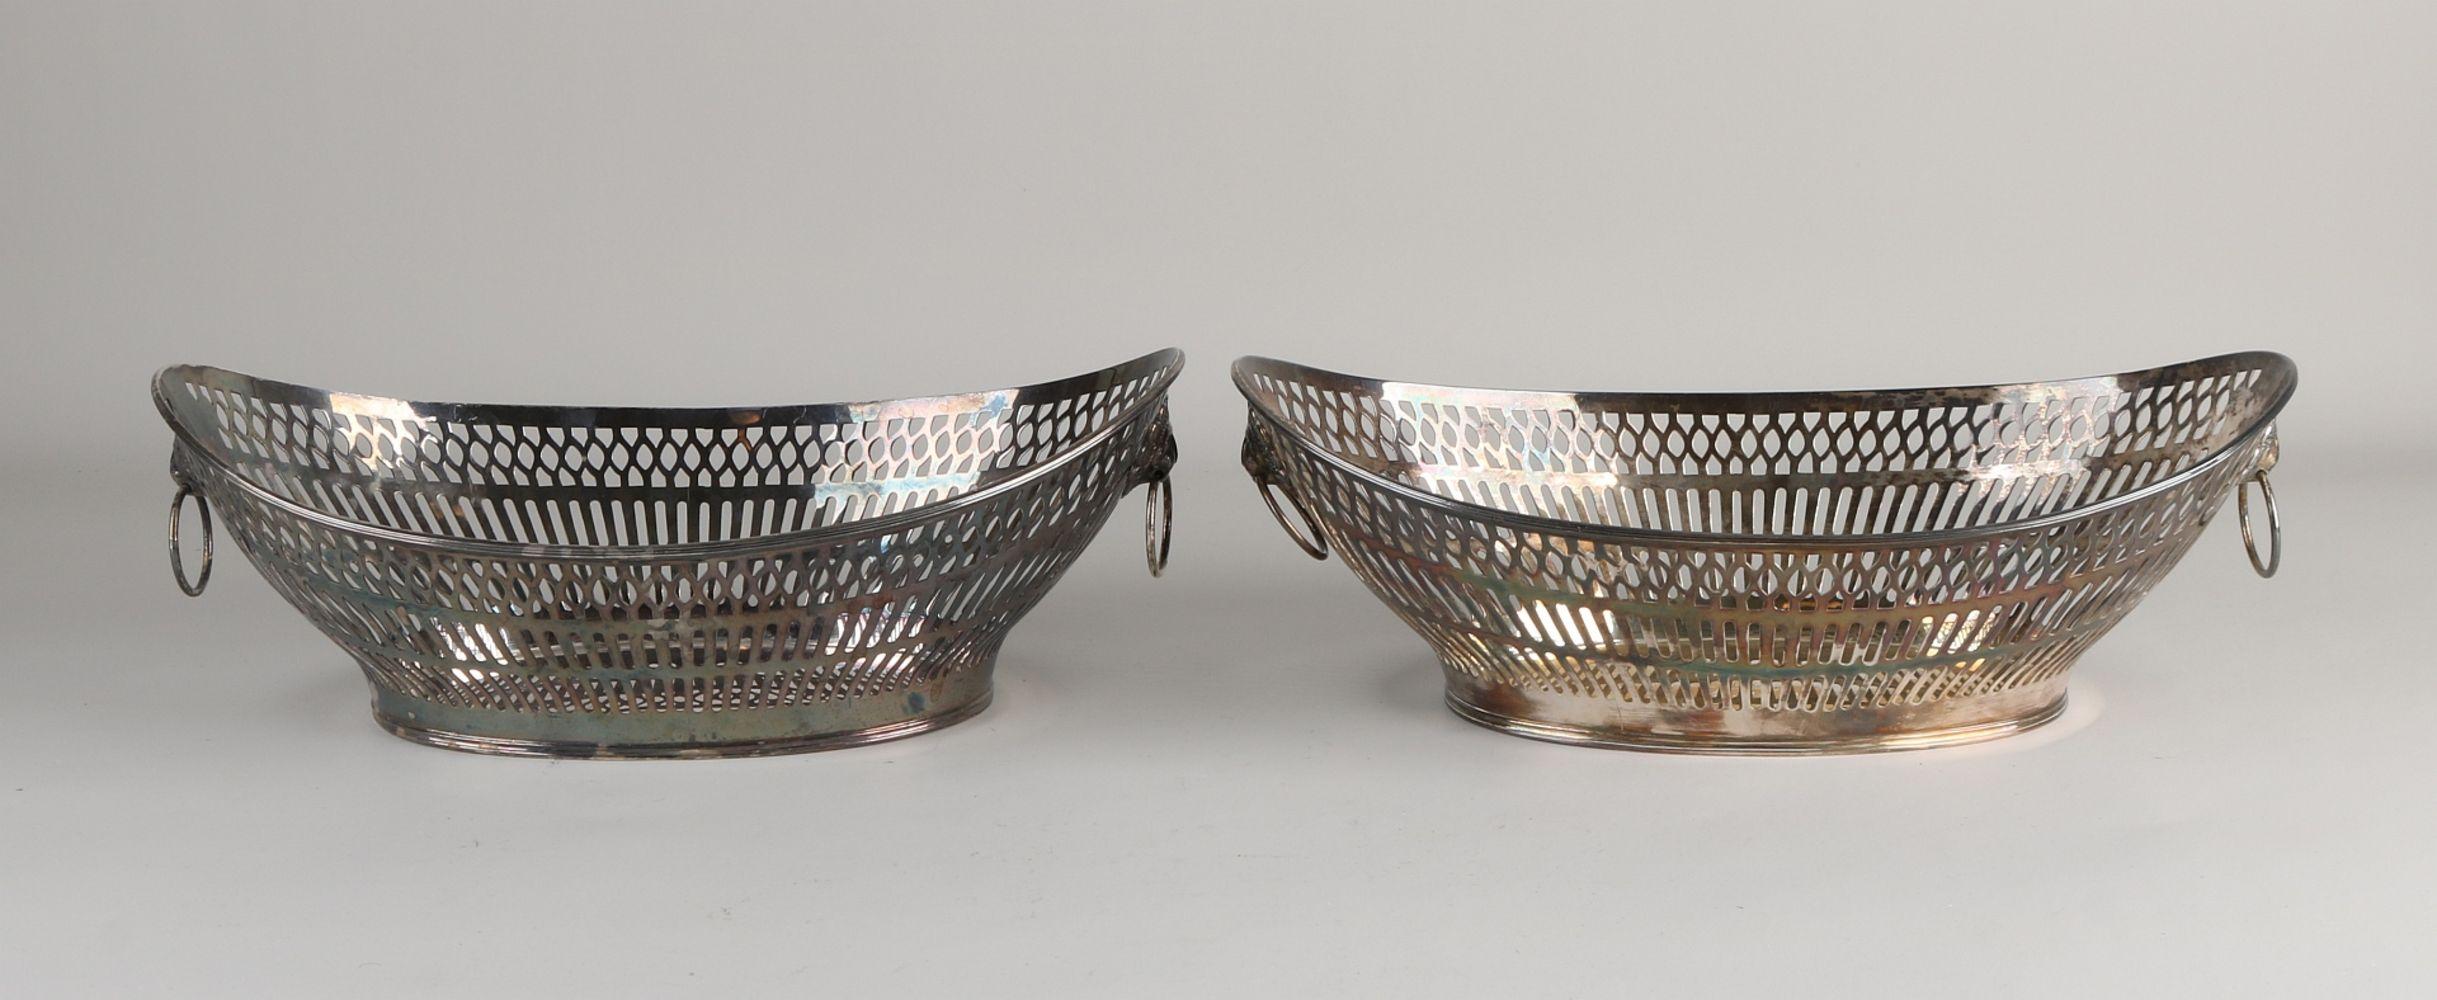 Art, Antiques, Design and Asian Arts: Timed February-auction Twents Veilinghuis